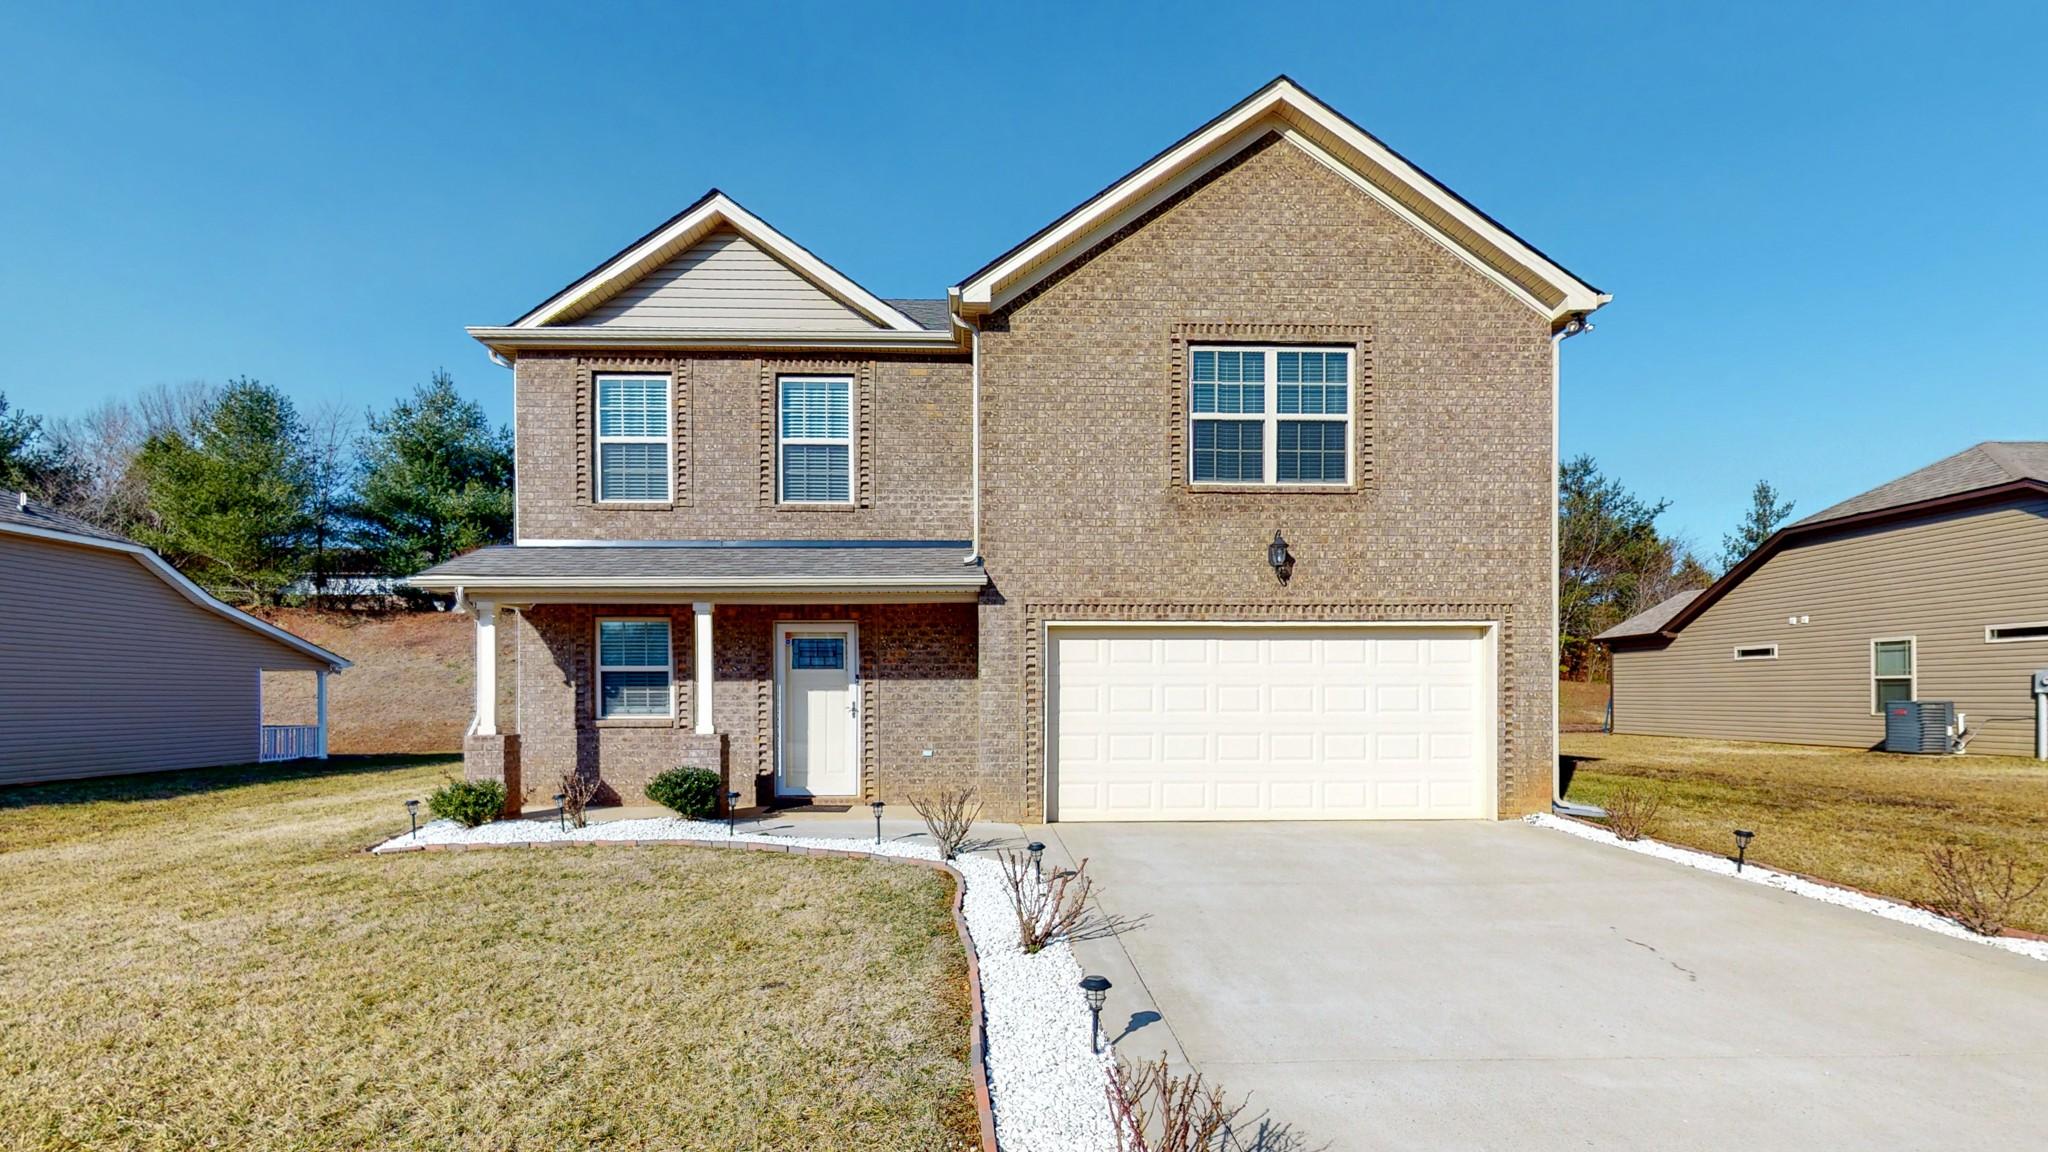 453 Golf Club Ln Property Photo - Springfield, TN real estate listing